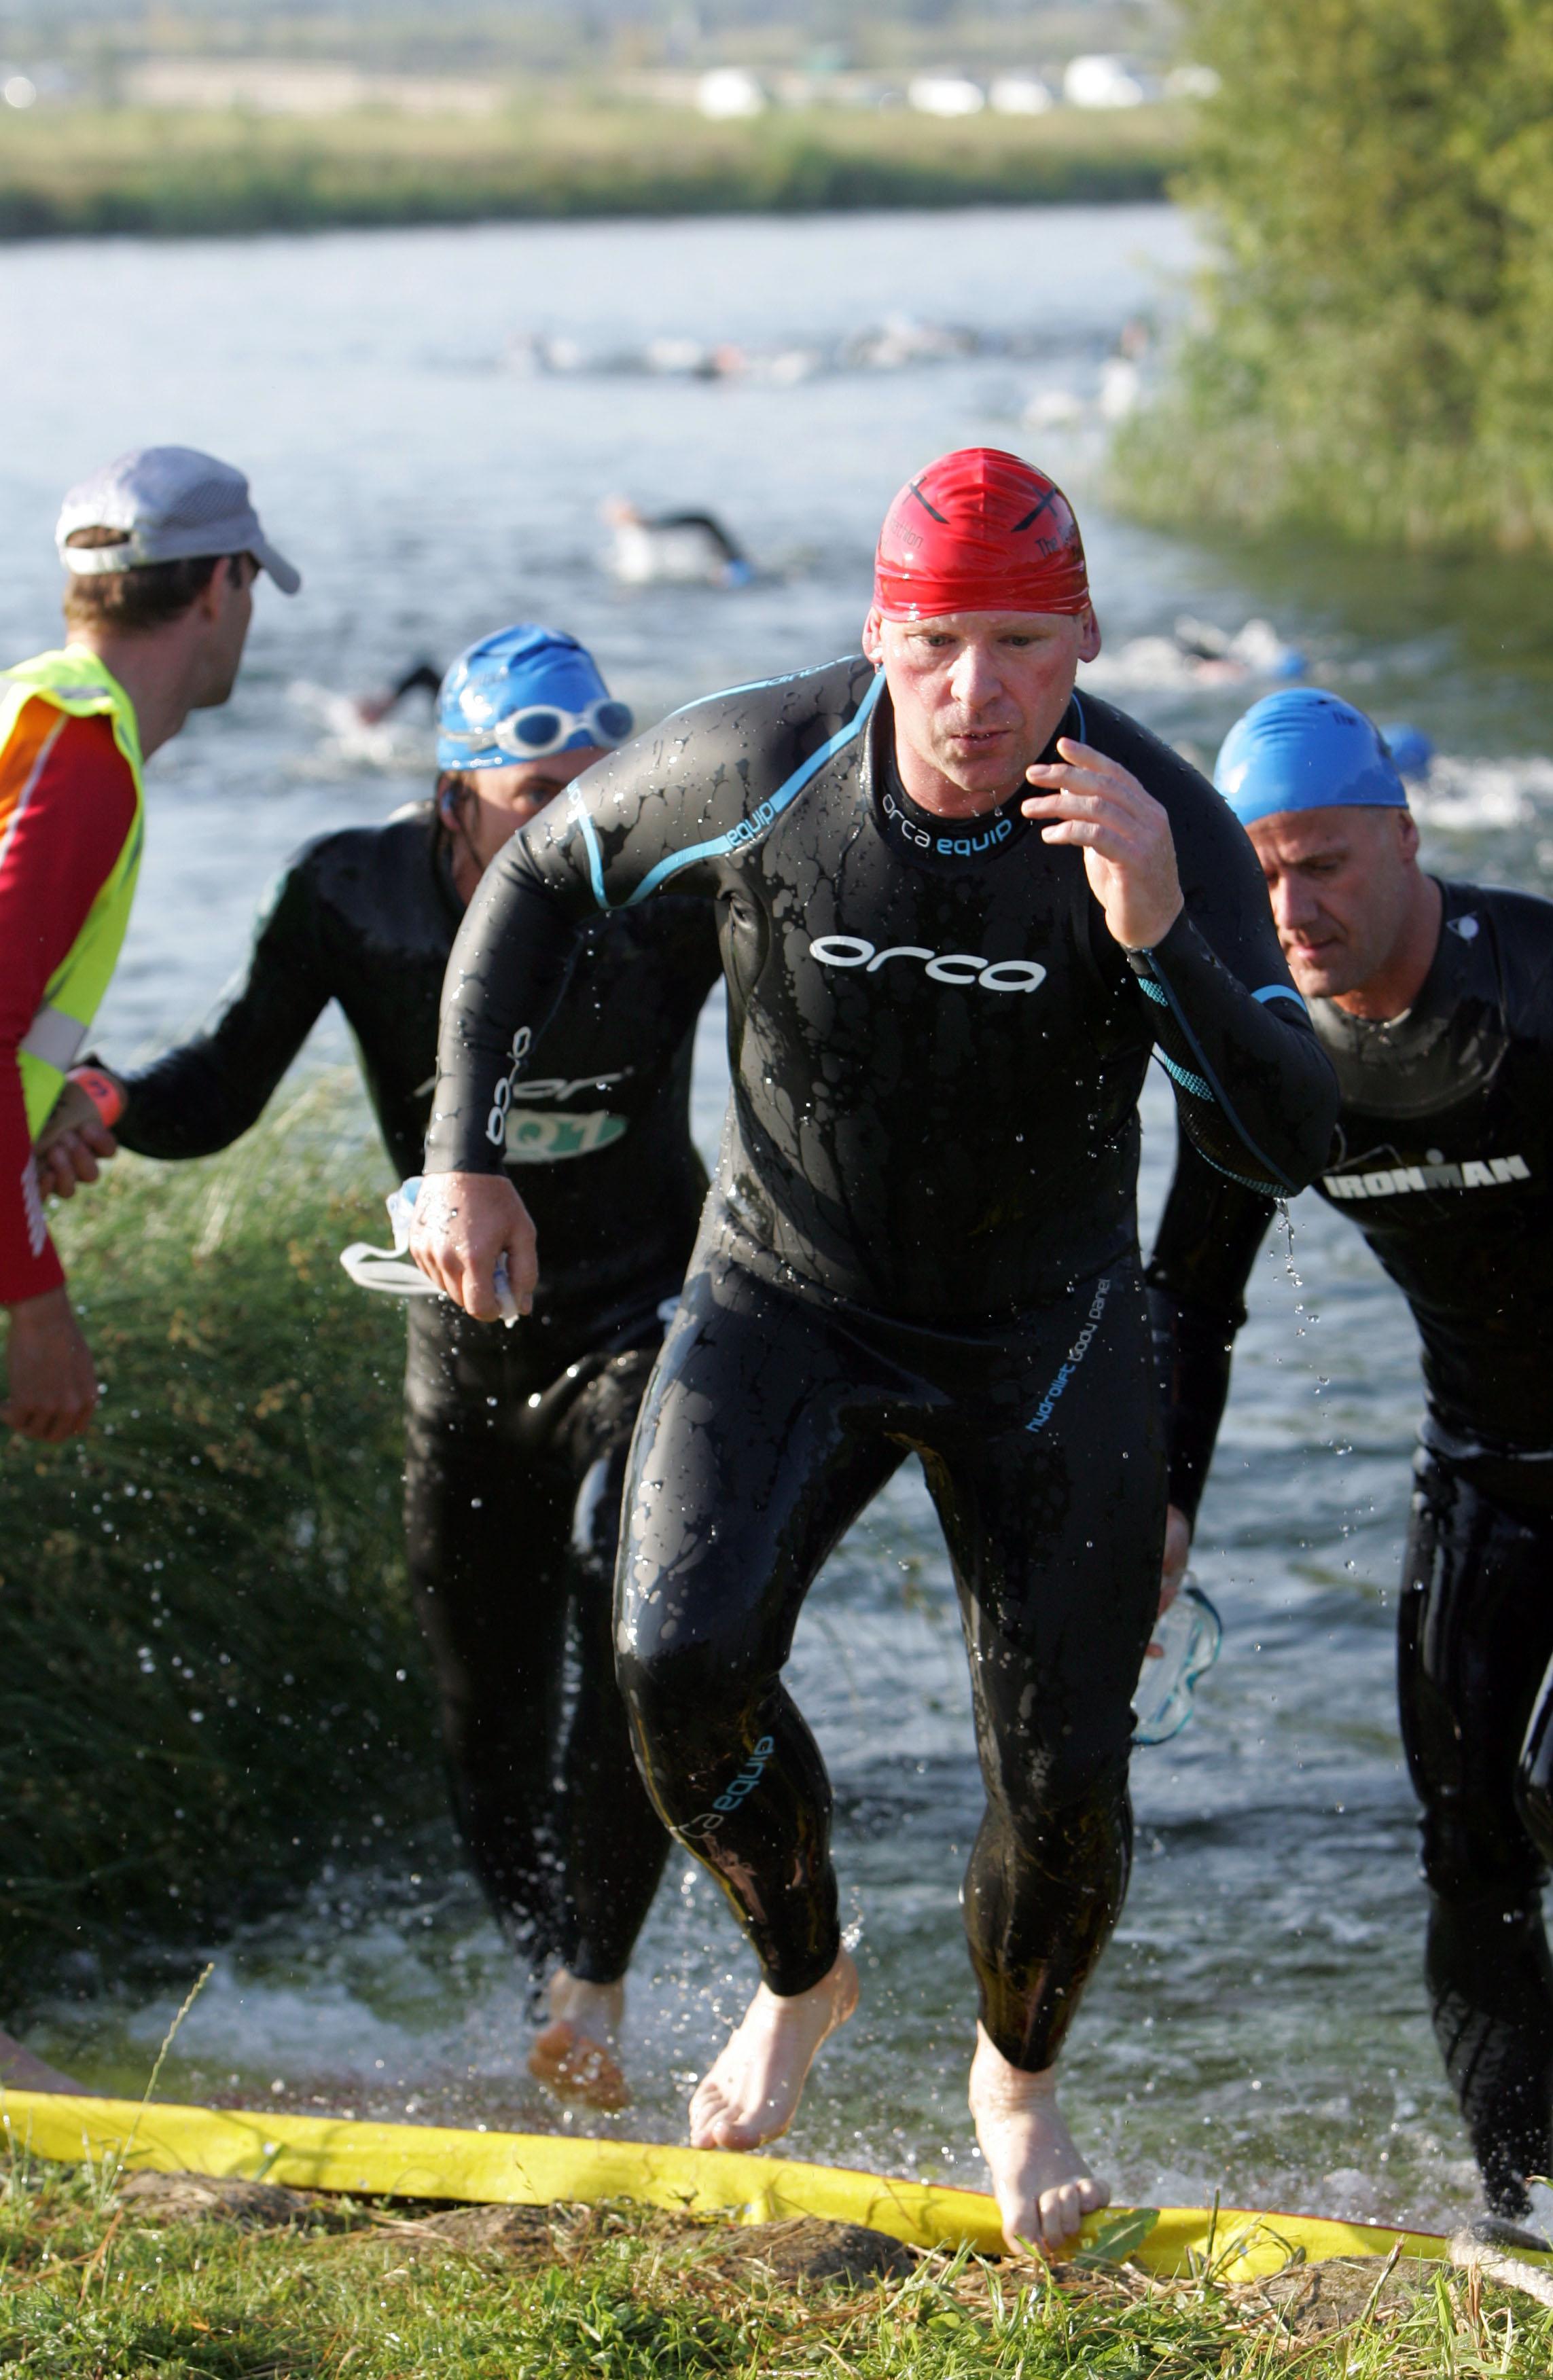 The Bridge Triathlon, Dartford. 27.6.10COPYRIGHT RICHARD EATON